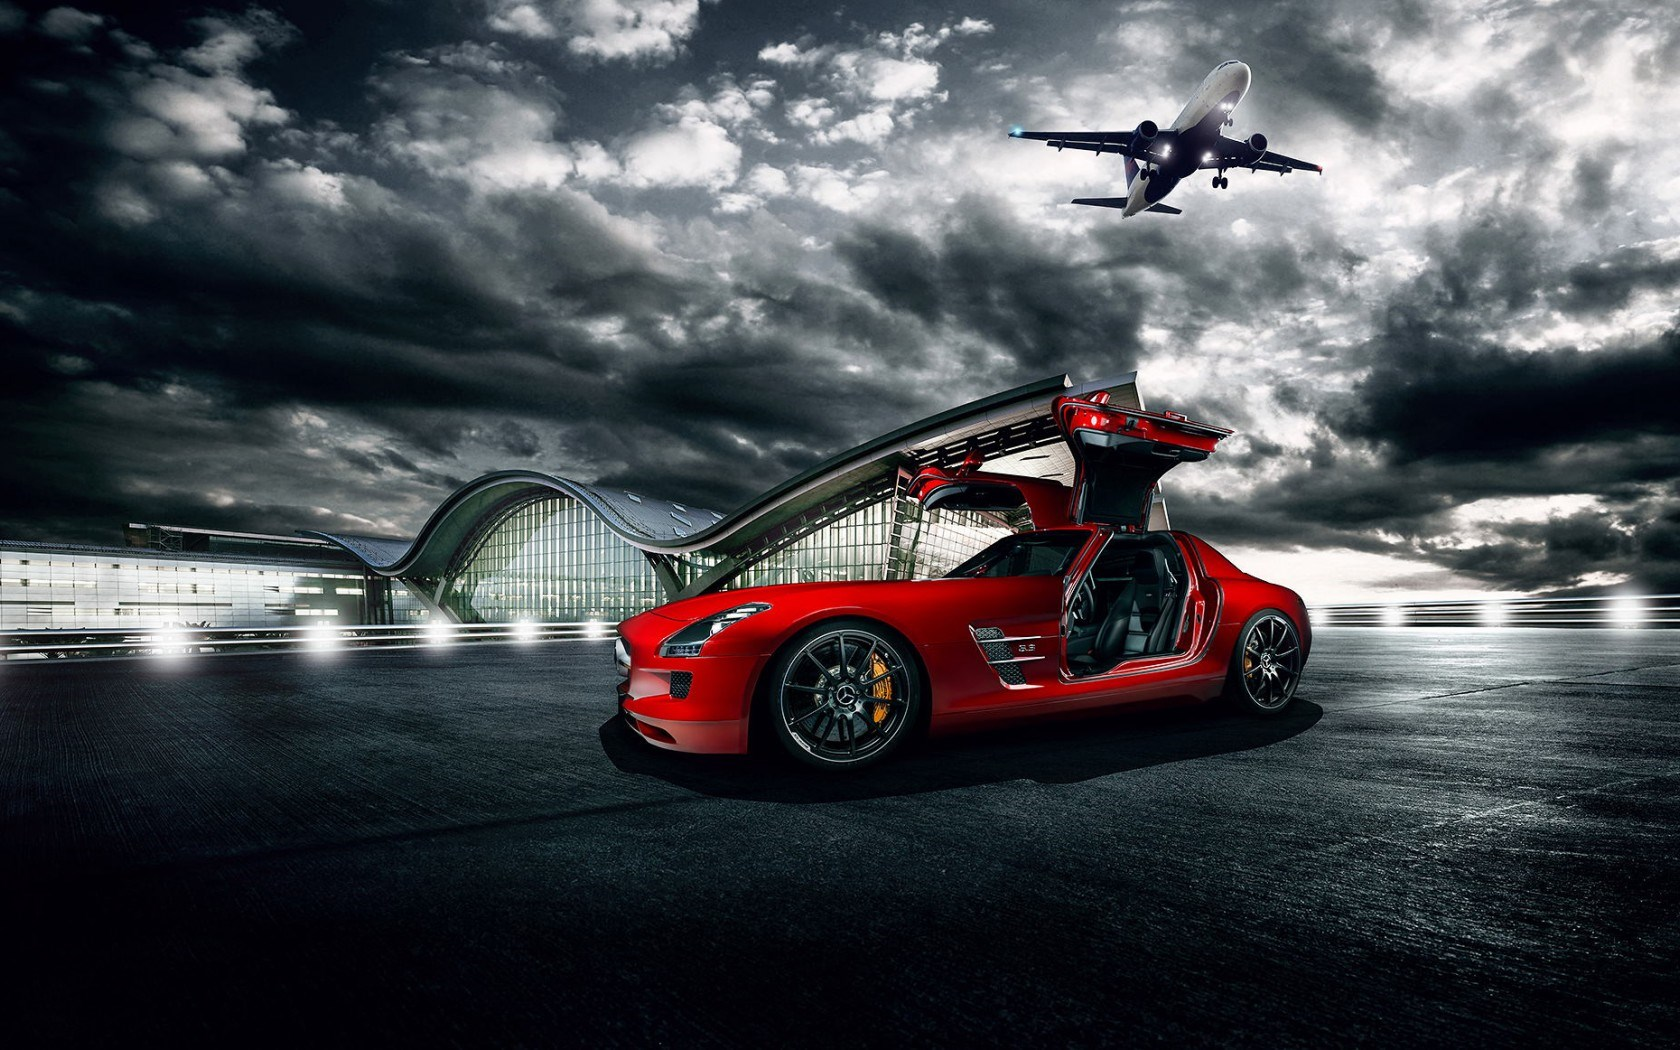 Desktop Wallpaper Cars Logos Ferrari 50 Super Sports Car Wallpapers That Ll Blow Your Desktop Away